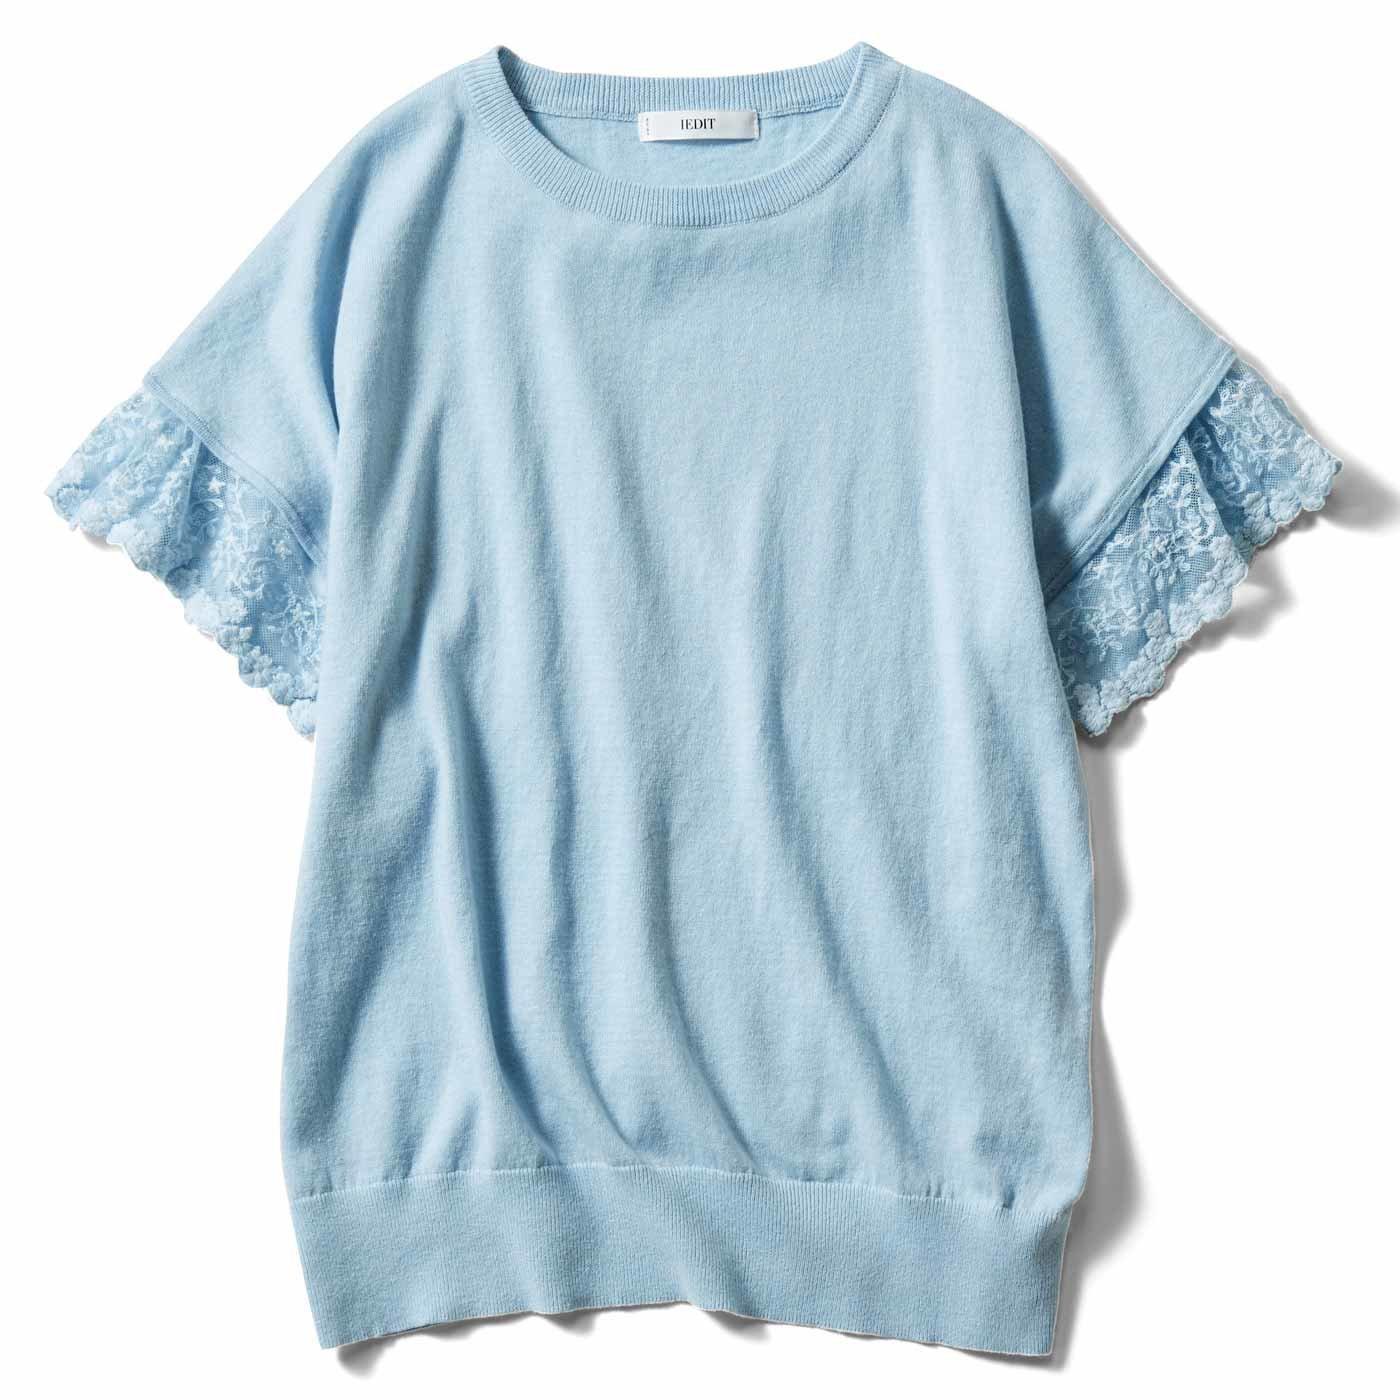 IEDIT[イディット] 綿素材で着心地快適 着映え袖レースニット〈サックスブルー〉